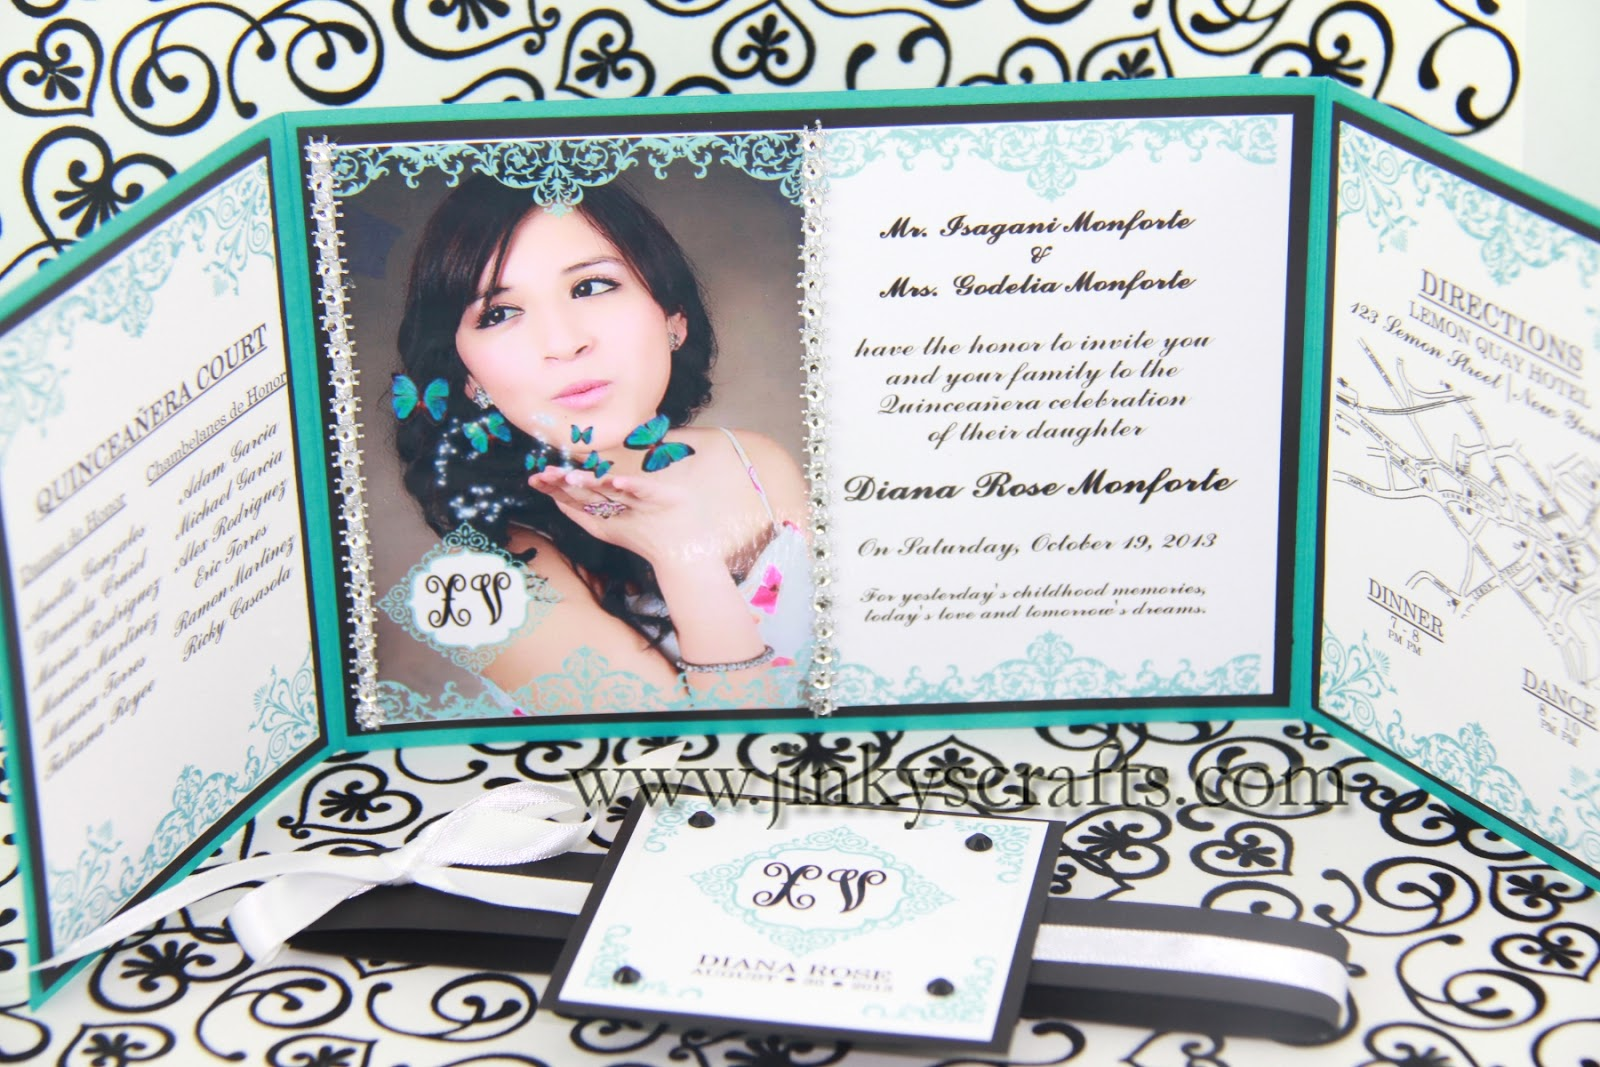 wedding picture caricature anniversary ideas - Jinky s Crafts & Designs Gate Fold Custom Invitations